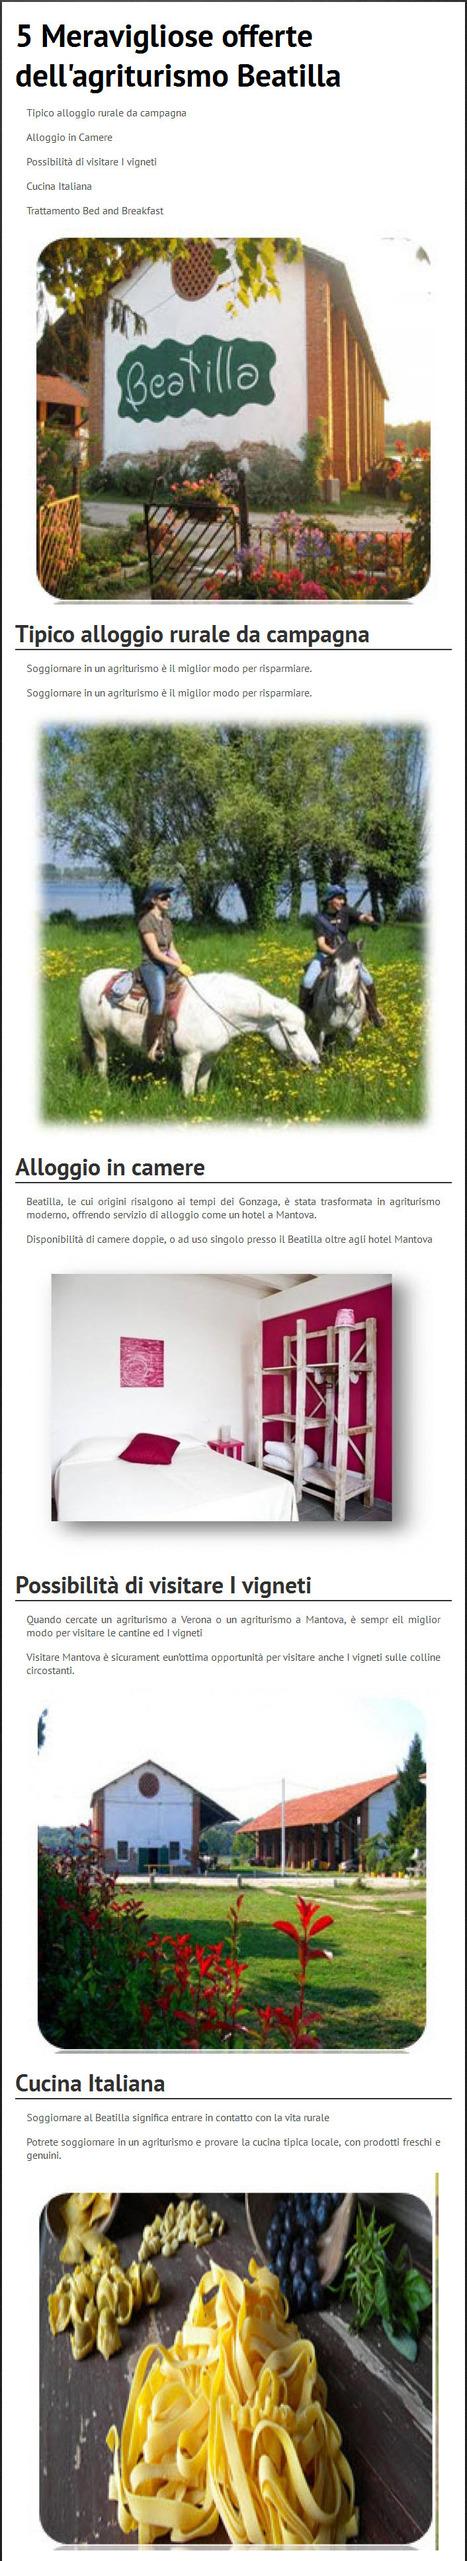 5 Meraviglioseoffertedell'agriturismoBeatilla - www.agriturismobeatilla.it | Agriturismo beatilla | Scoop.it